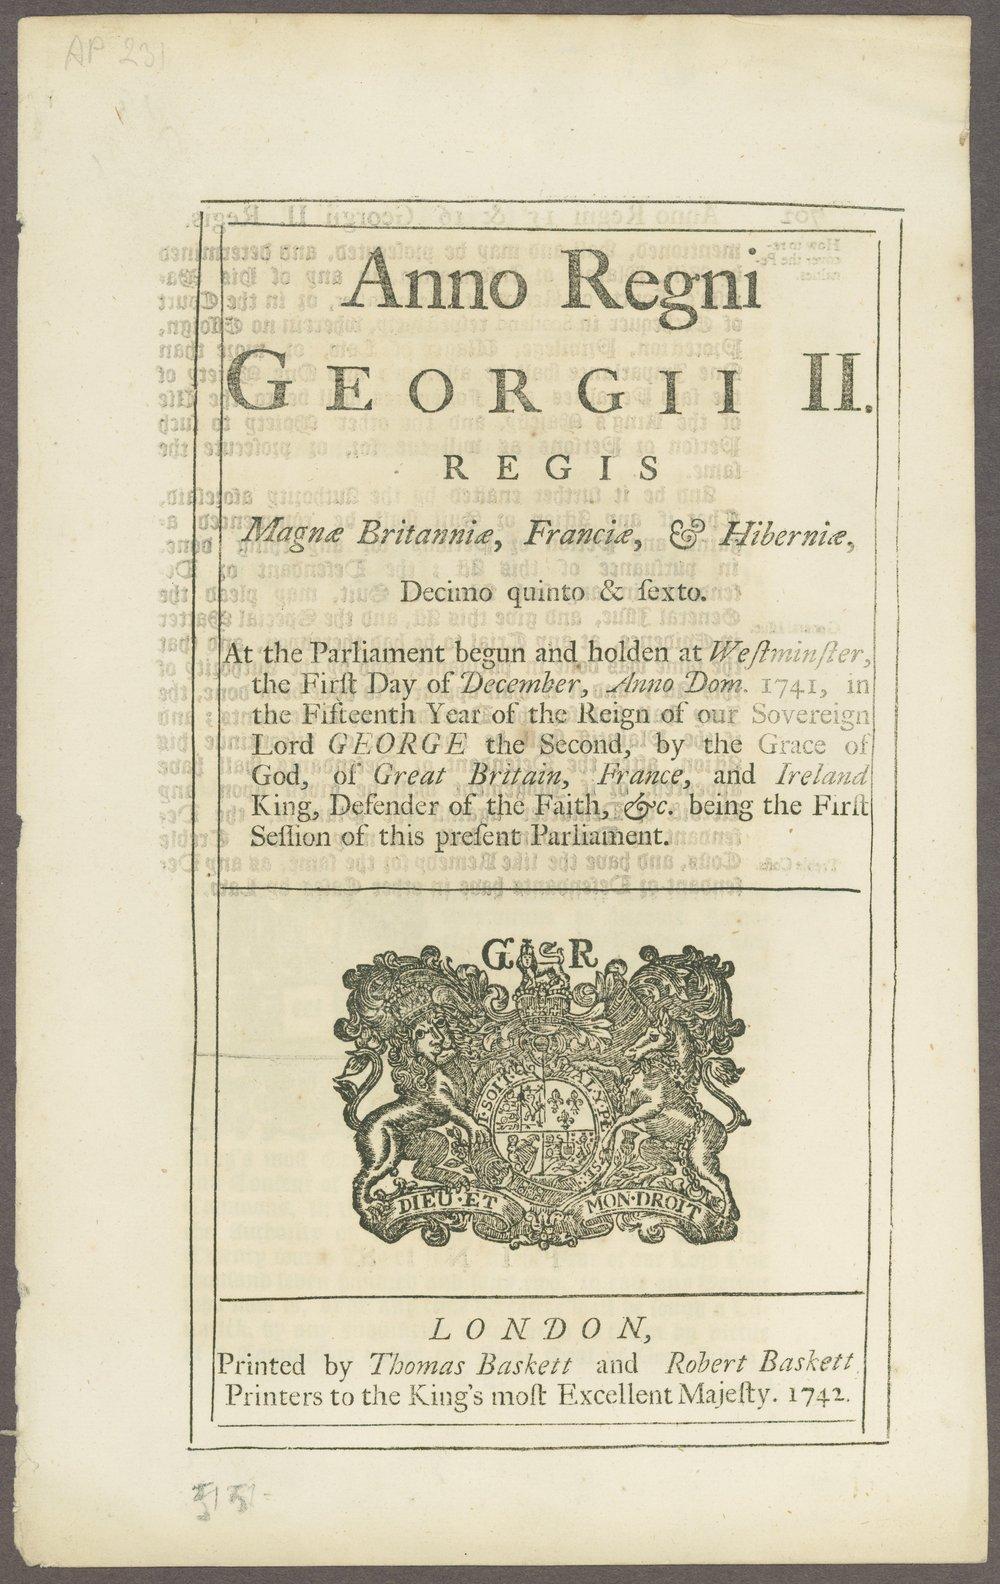 King George III materials - 1 [Box 1, Folder 1]